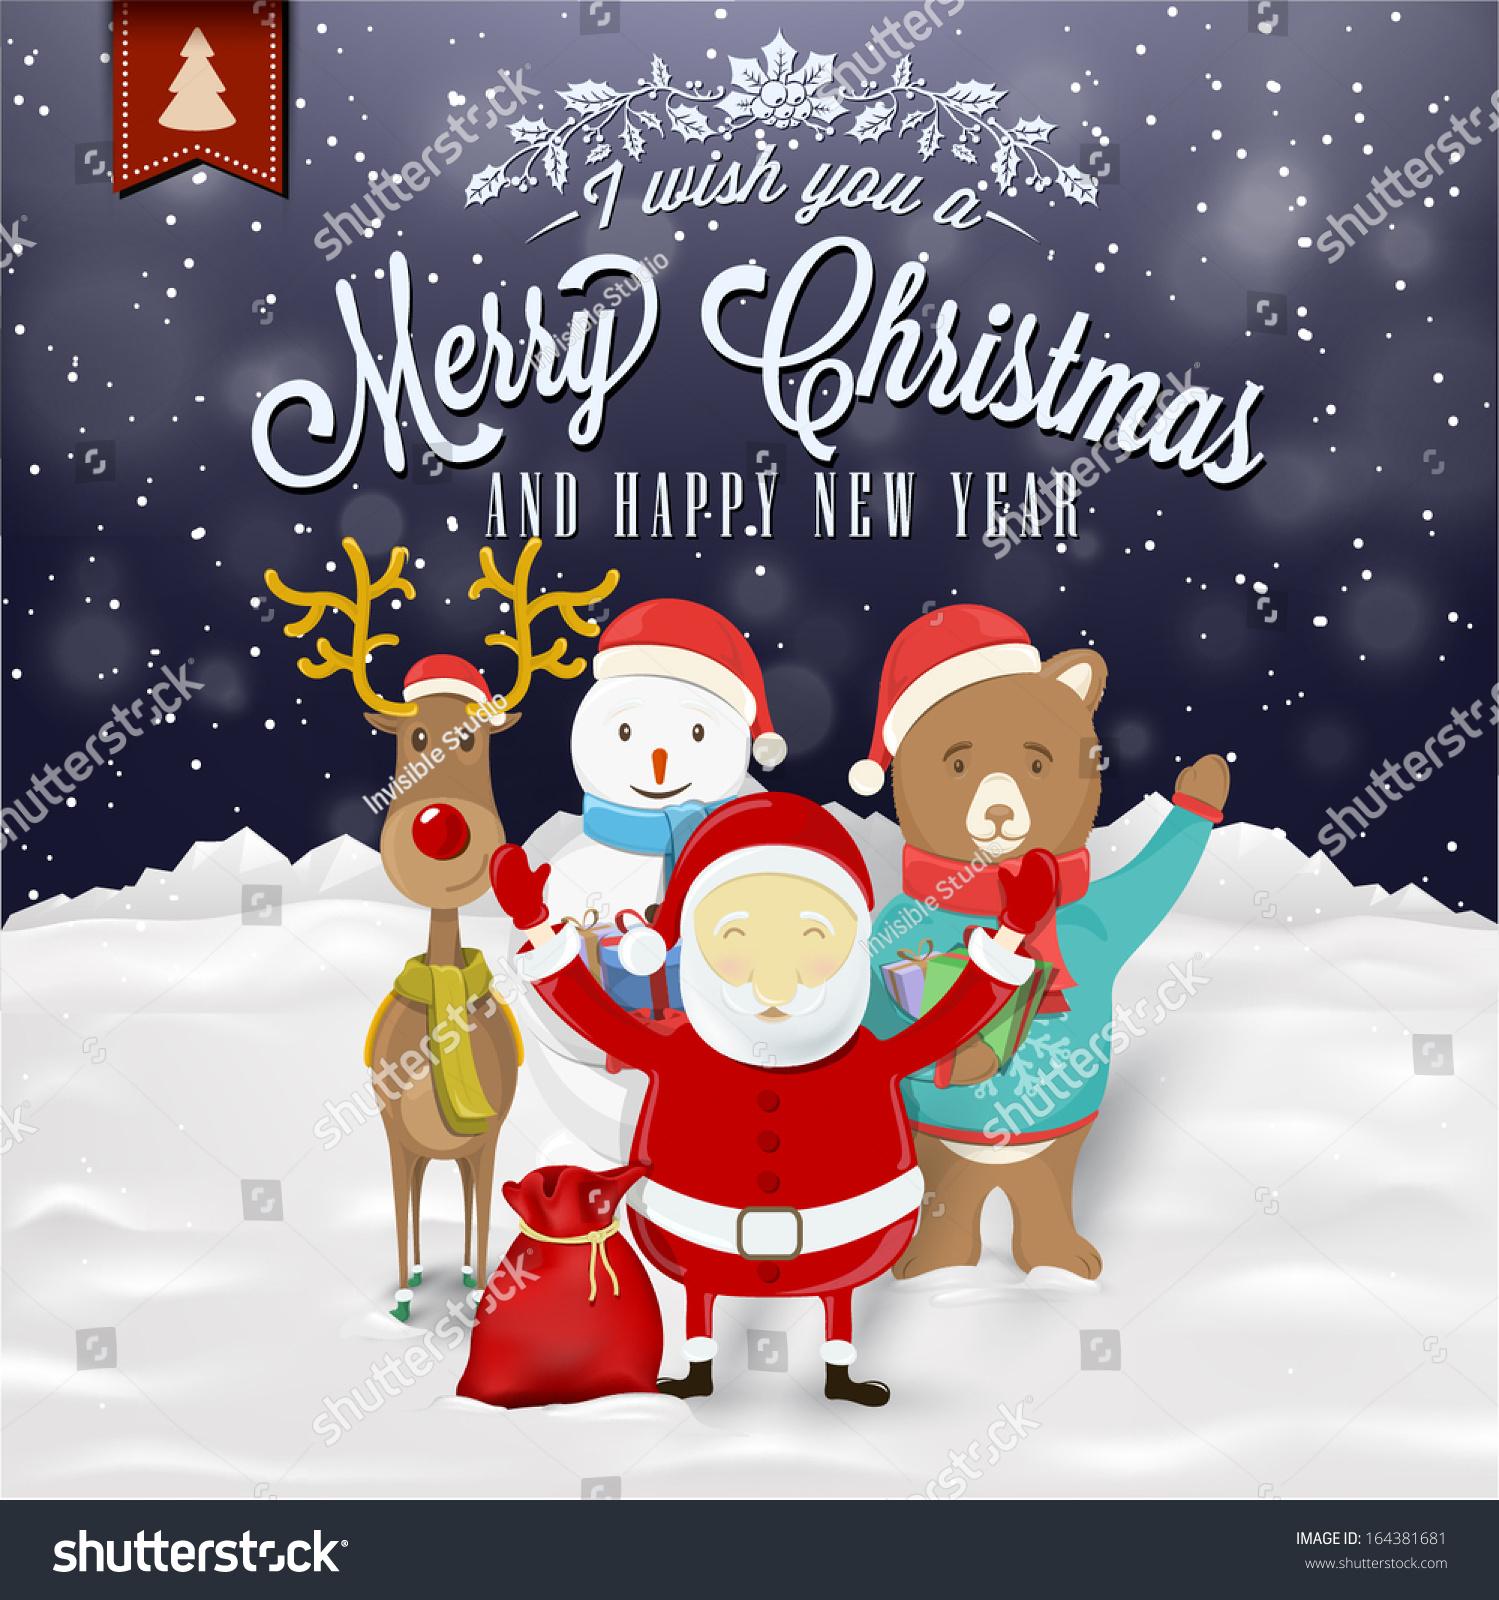 Funny christmas greeting card santa claus stock photo photo vector funny christmas greeting card with santa claus deer snowman and bear m4hsunfo